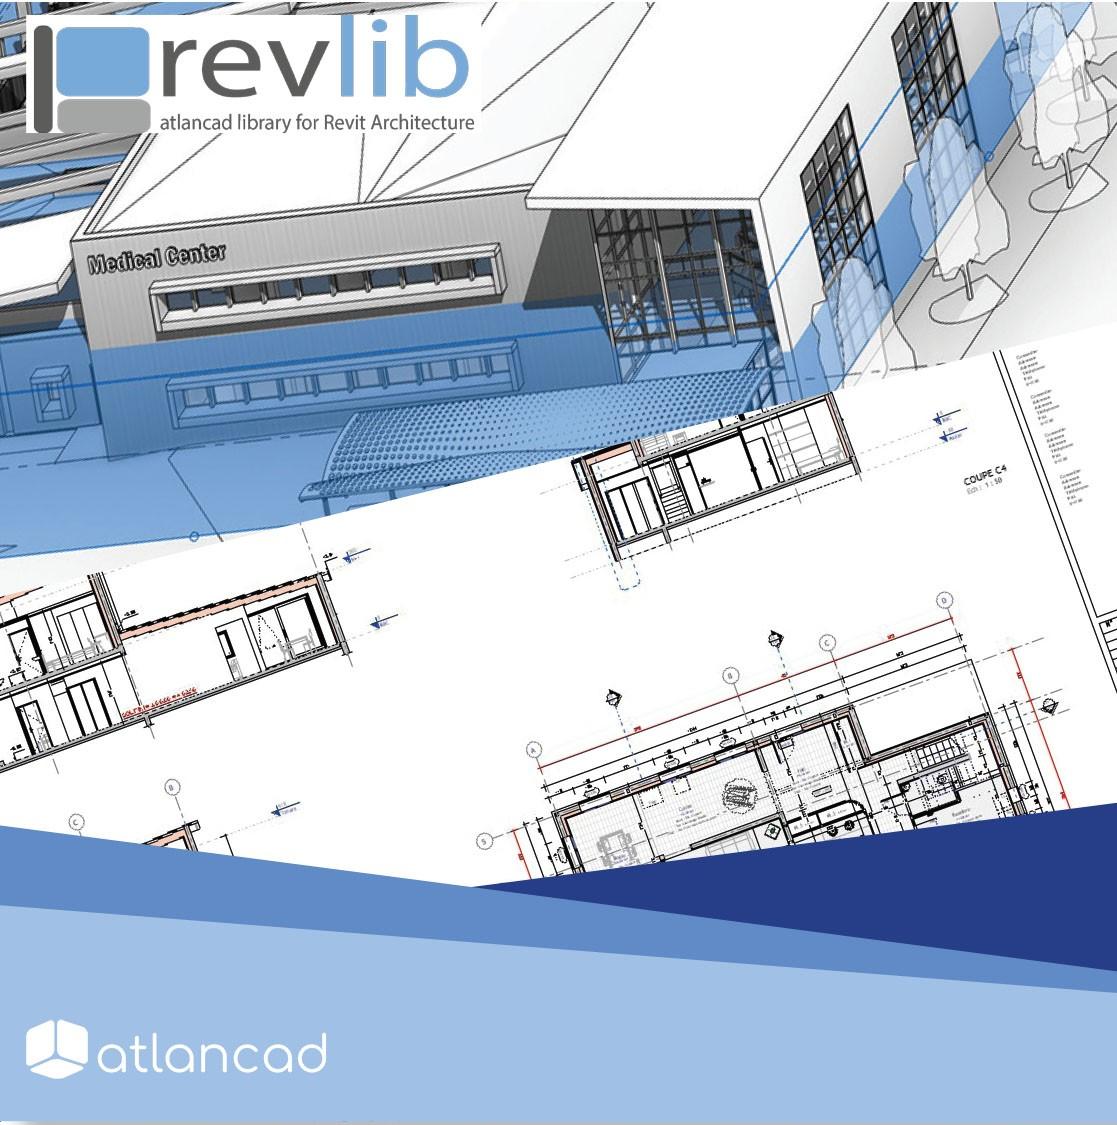 Revlib Architecture